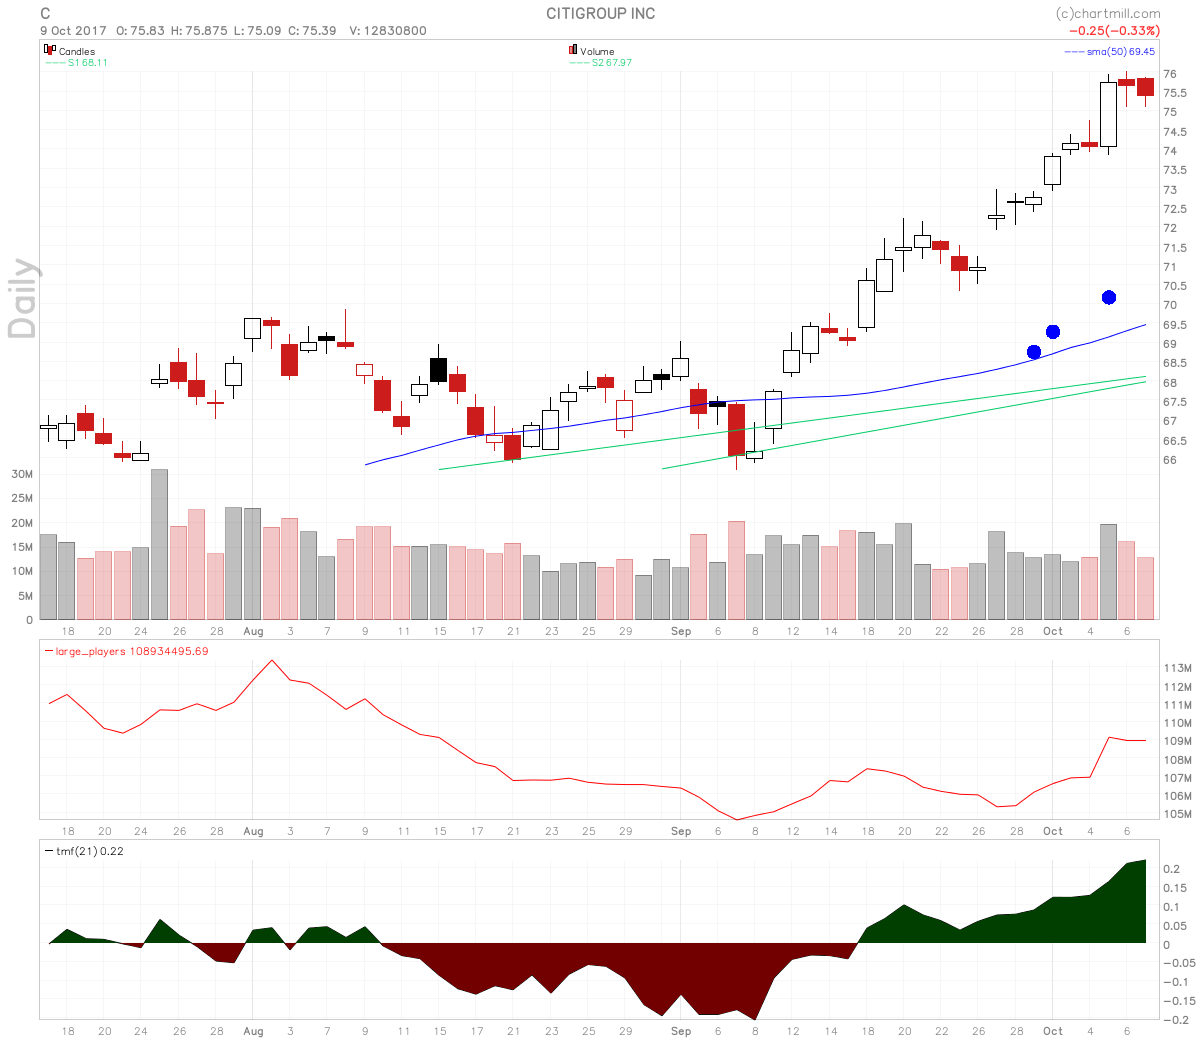 Citigroup stock